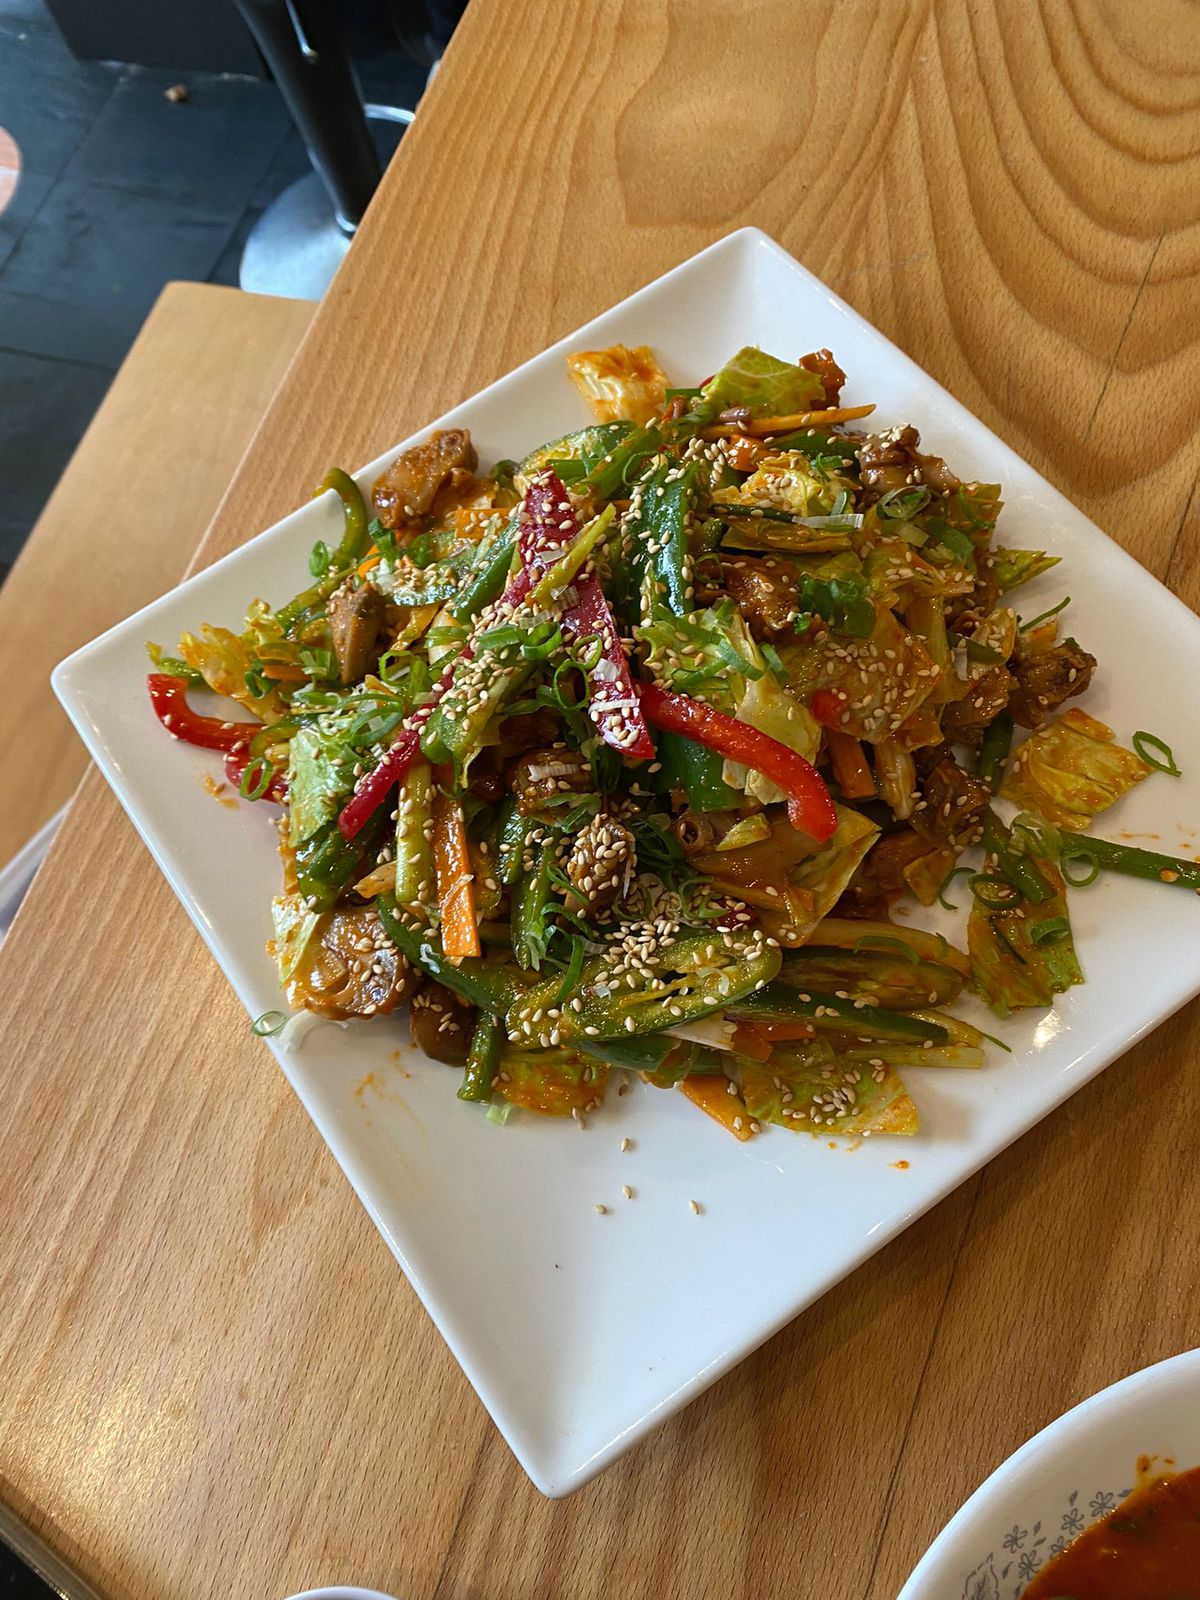 Sea snail —whelk —salad at Imone